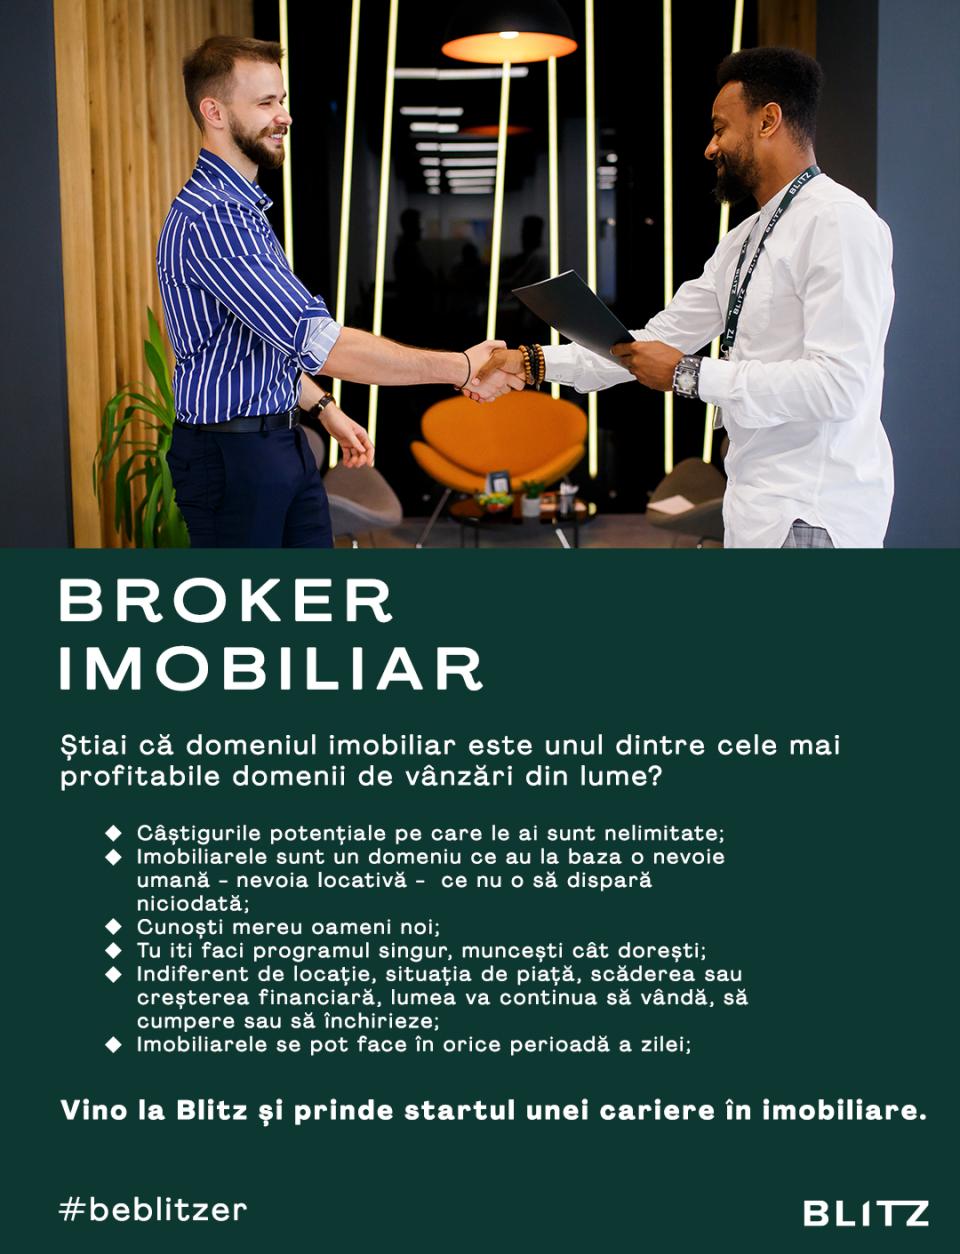 Broker Imobiliar, Agent imobiliarBlitz reprezinta de un deceniu pe piata imobiliara clujeana un reper in ce priveste calitatea si diversitatea serviciilor imobiliare, oferite printr-o retea extinsa de agenti imobiliari specializati, supusi continuu unor procese de crestere si dezvoltare profesionala.Fiind cea mai importanta agentie imobiliara din Cluj, ne caracterizeaza orientarea spre nevoile fiecarui client, motiv pentru care ne diversificam si personalizam permanent gama de servicii integrate de consultanta imobiliara, astfel incat clientii nostri sa castige timp, sa depuna efort minim si sa primeasca cat mai mult posibil, inainte, in timpul si dupa finalizarea tranzactiei imobiliare.